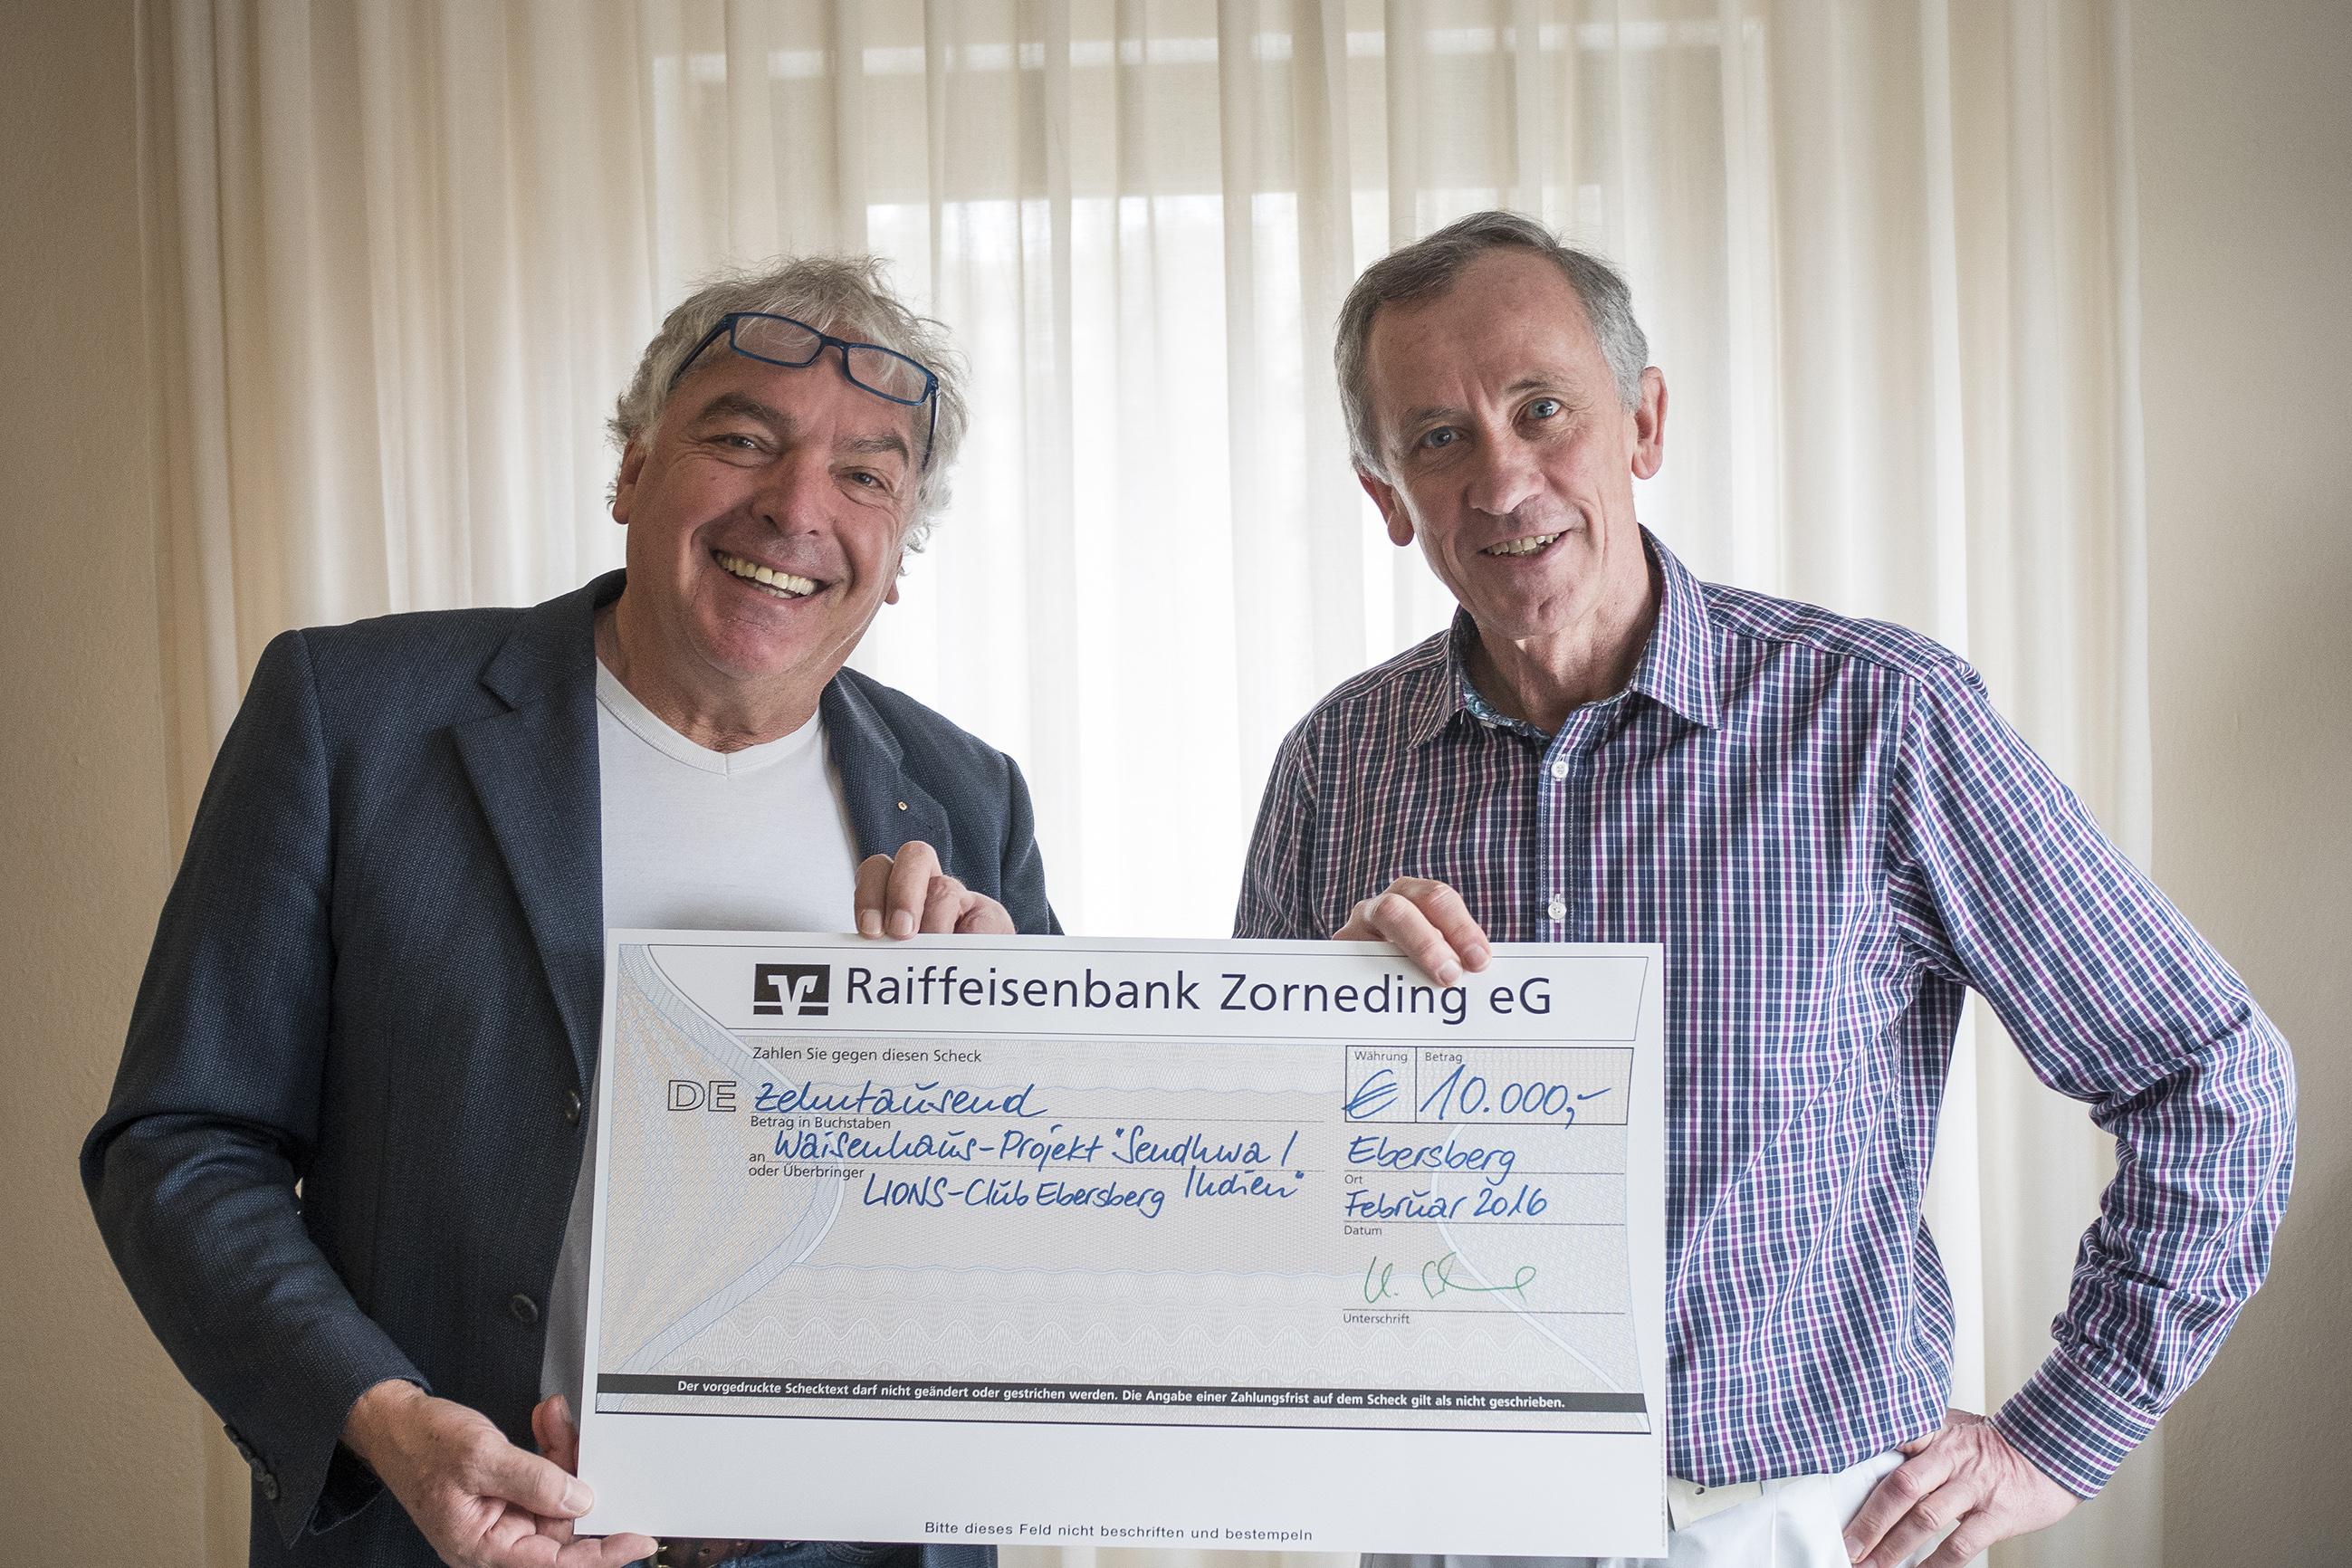 Symbolische Scheck-Übergabe mit DR. Franz Weinfurtner vom LIONS-Club Ebersberg und Prof Dr Hajo Schneck vom Ebersberger Förderverein Interplast e.V. (EFI e.V.) (foto: sro)